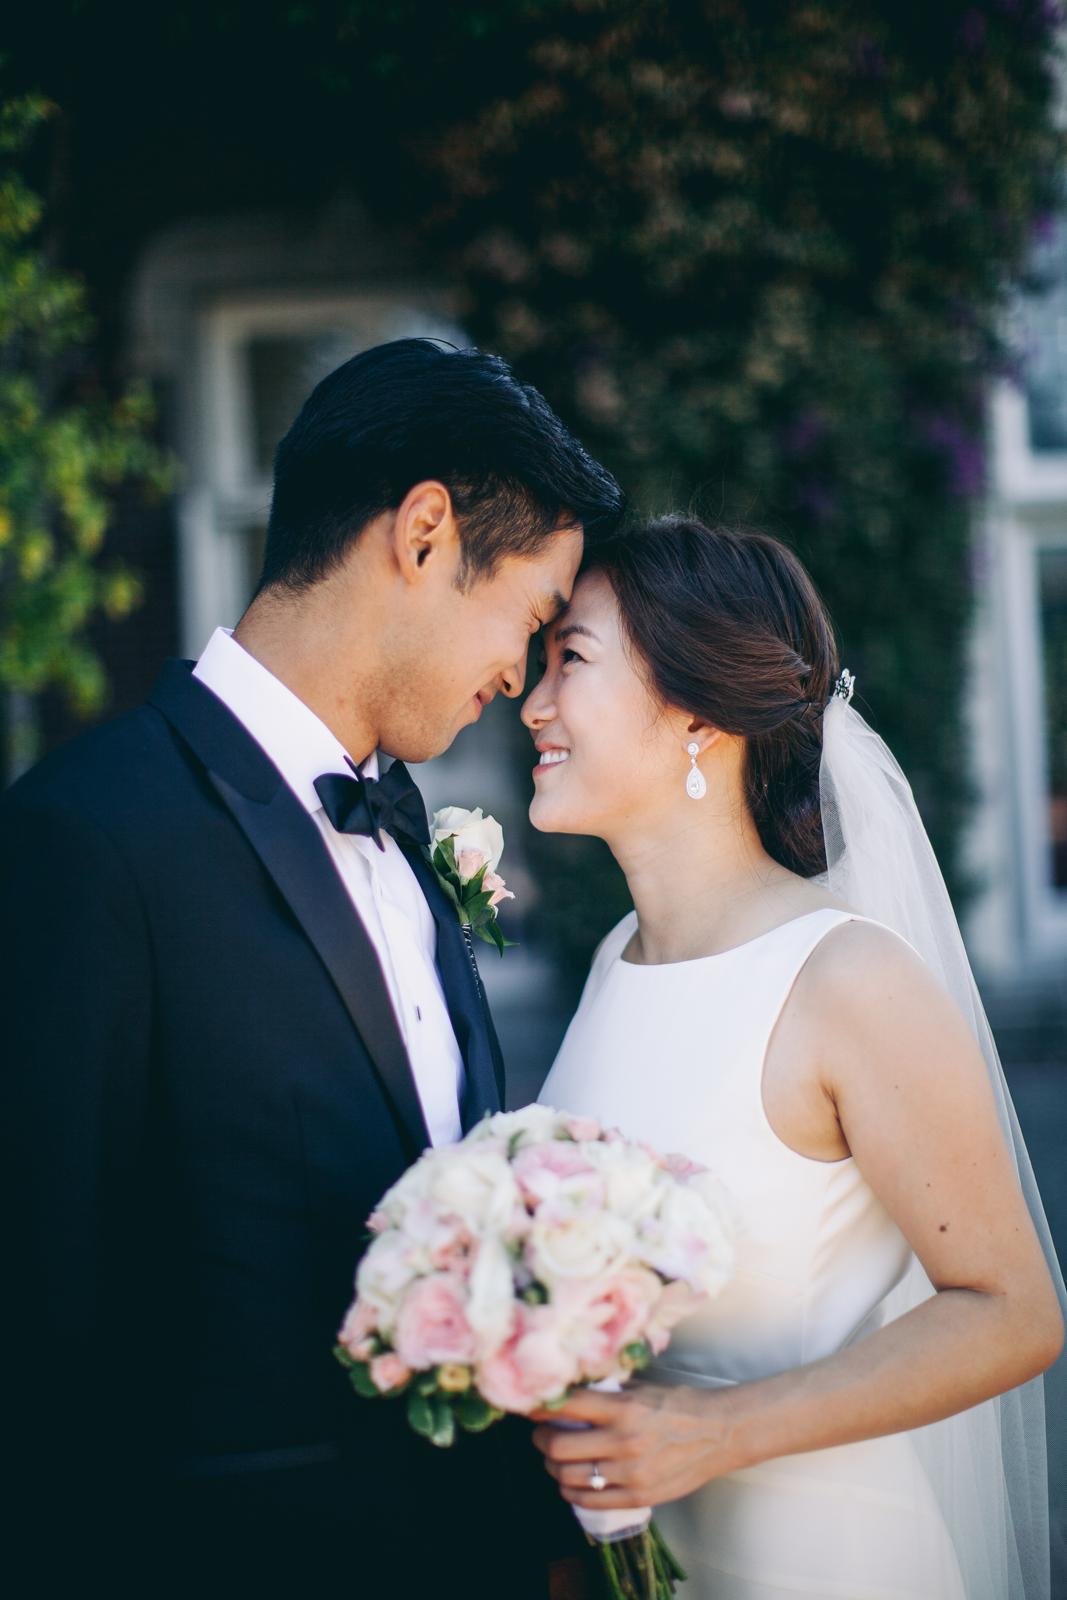 kohl_manison_wedding_photography_sarah_eric_ebony_siovhan_bokeh_photography_032.jpg